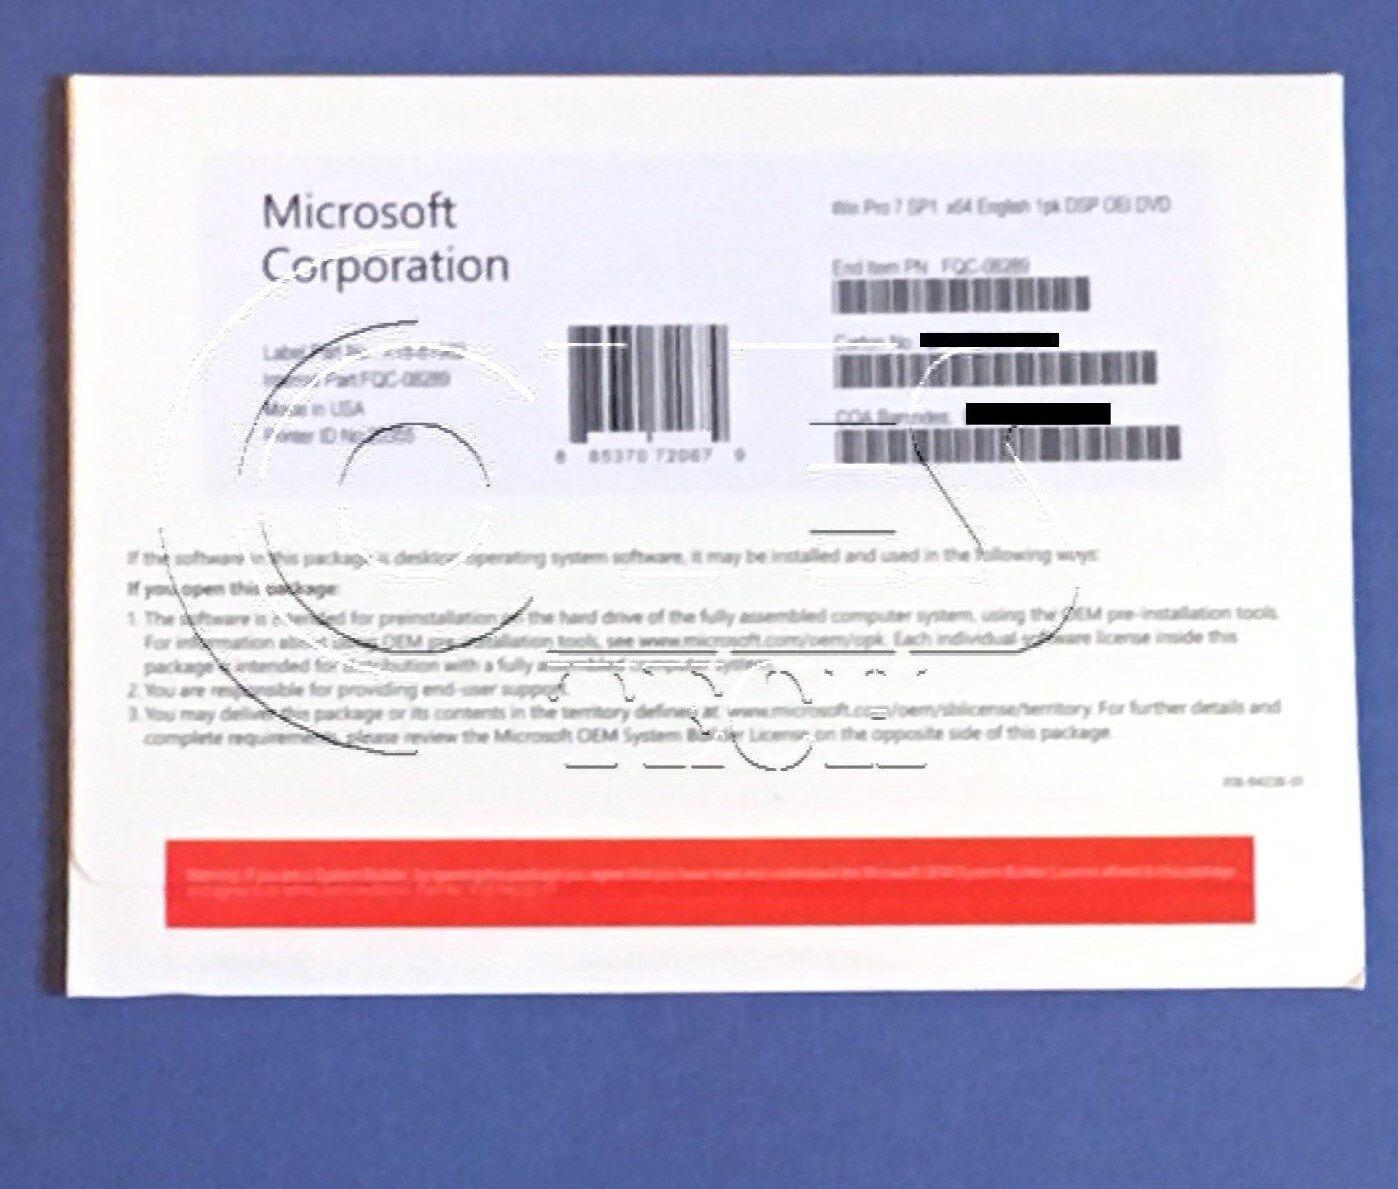 Windows 7 Professional SP1 64bit  System Builder DVD 1 Pack